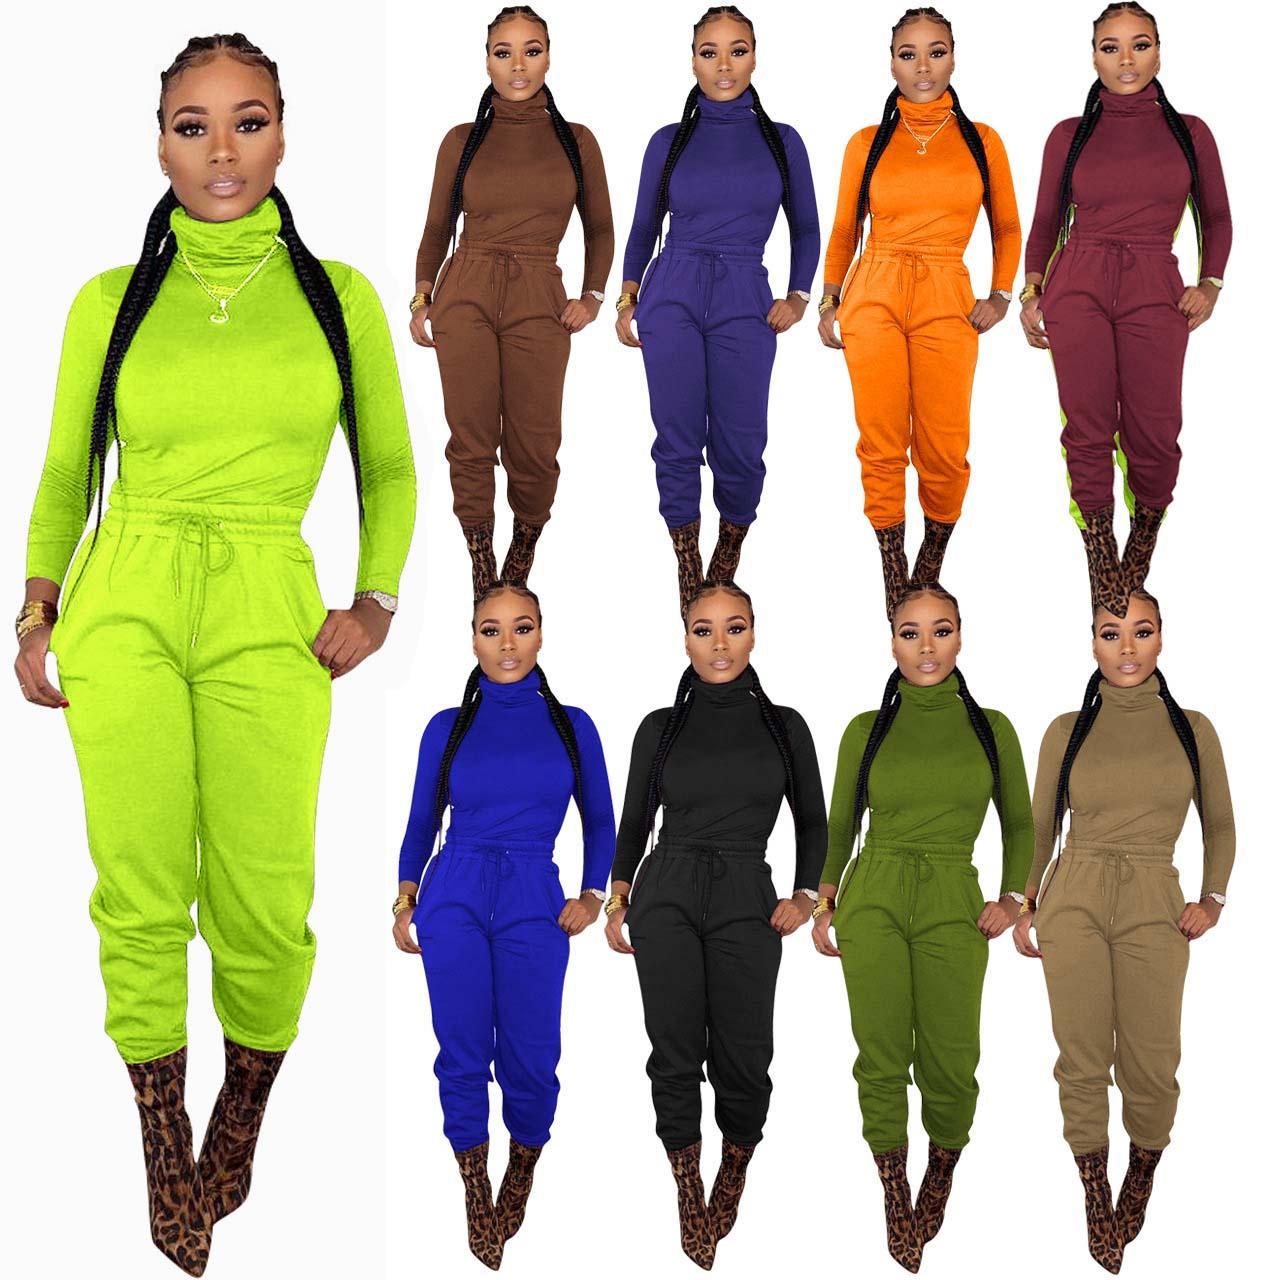 Mulheres Sólidas Cores 2 Conjuntos de Tracksuit de Dois Peça Fall Winter Roupas Pescoço Alto Pullovers Elastic Cintura Calças Suor Sweat Sportswear